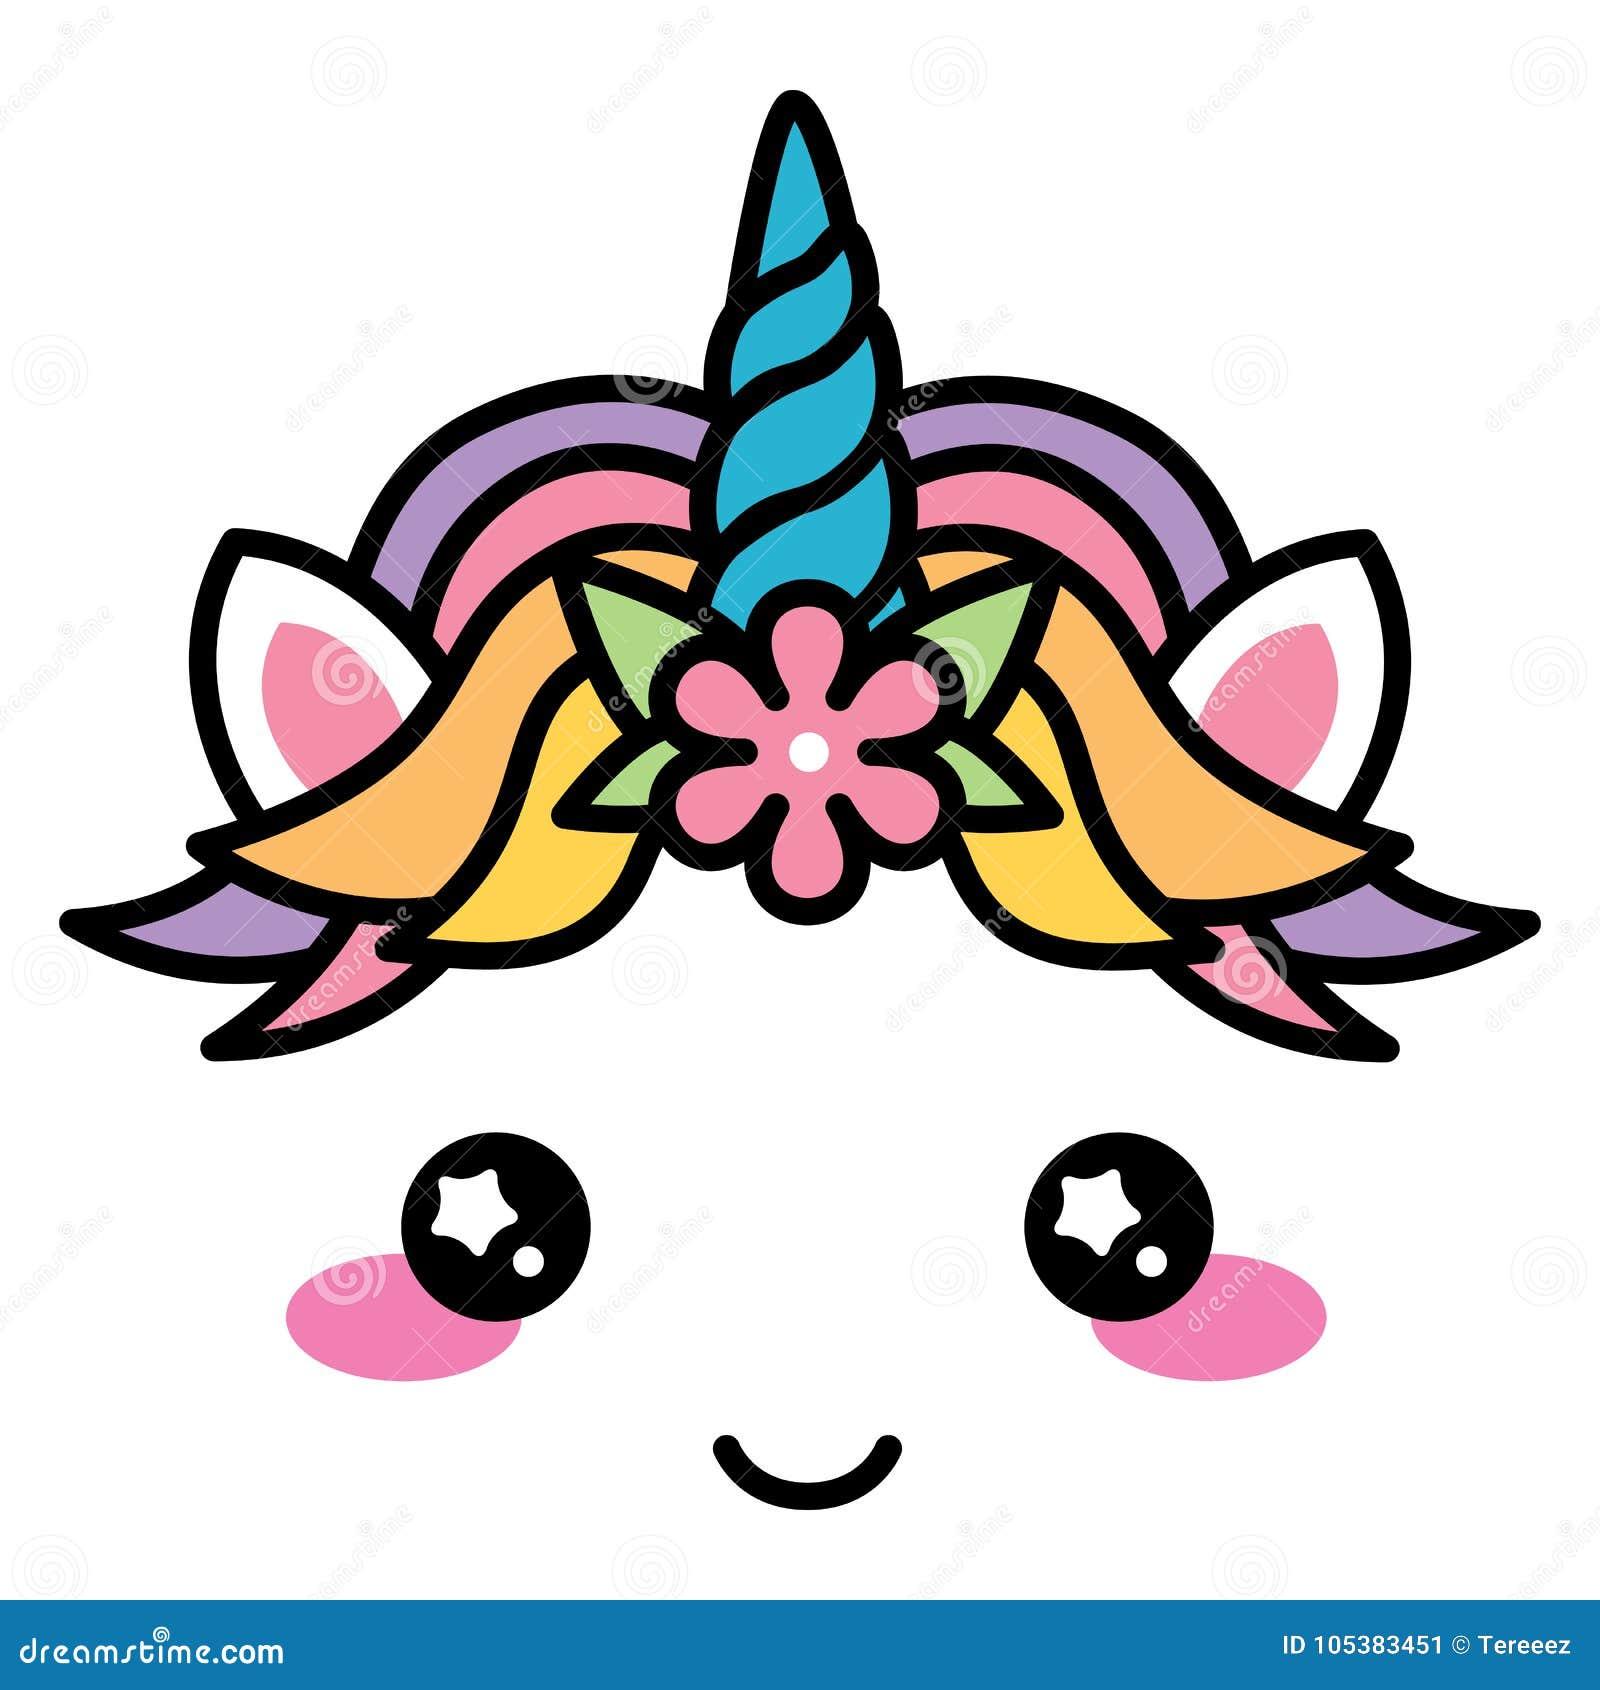 Kawaii cute unicorn face rainbow pastel color with flower